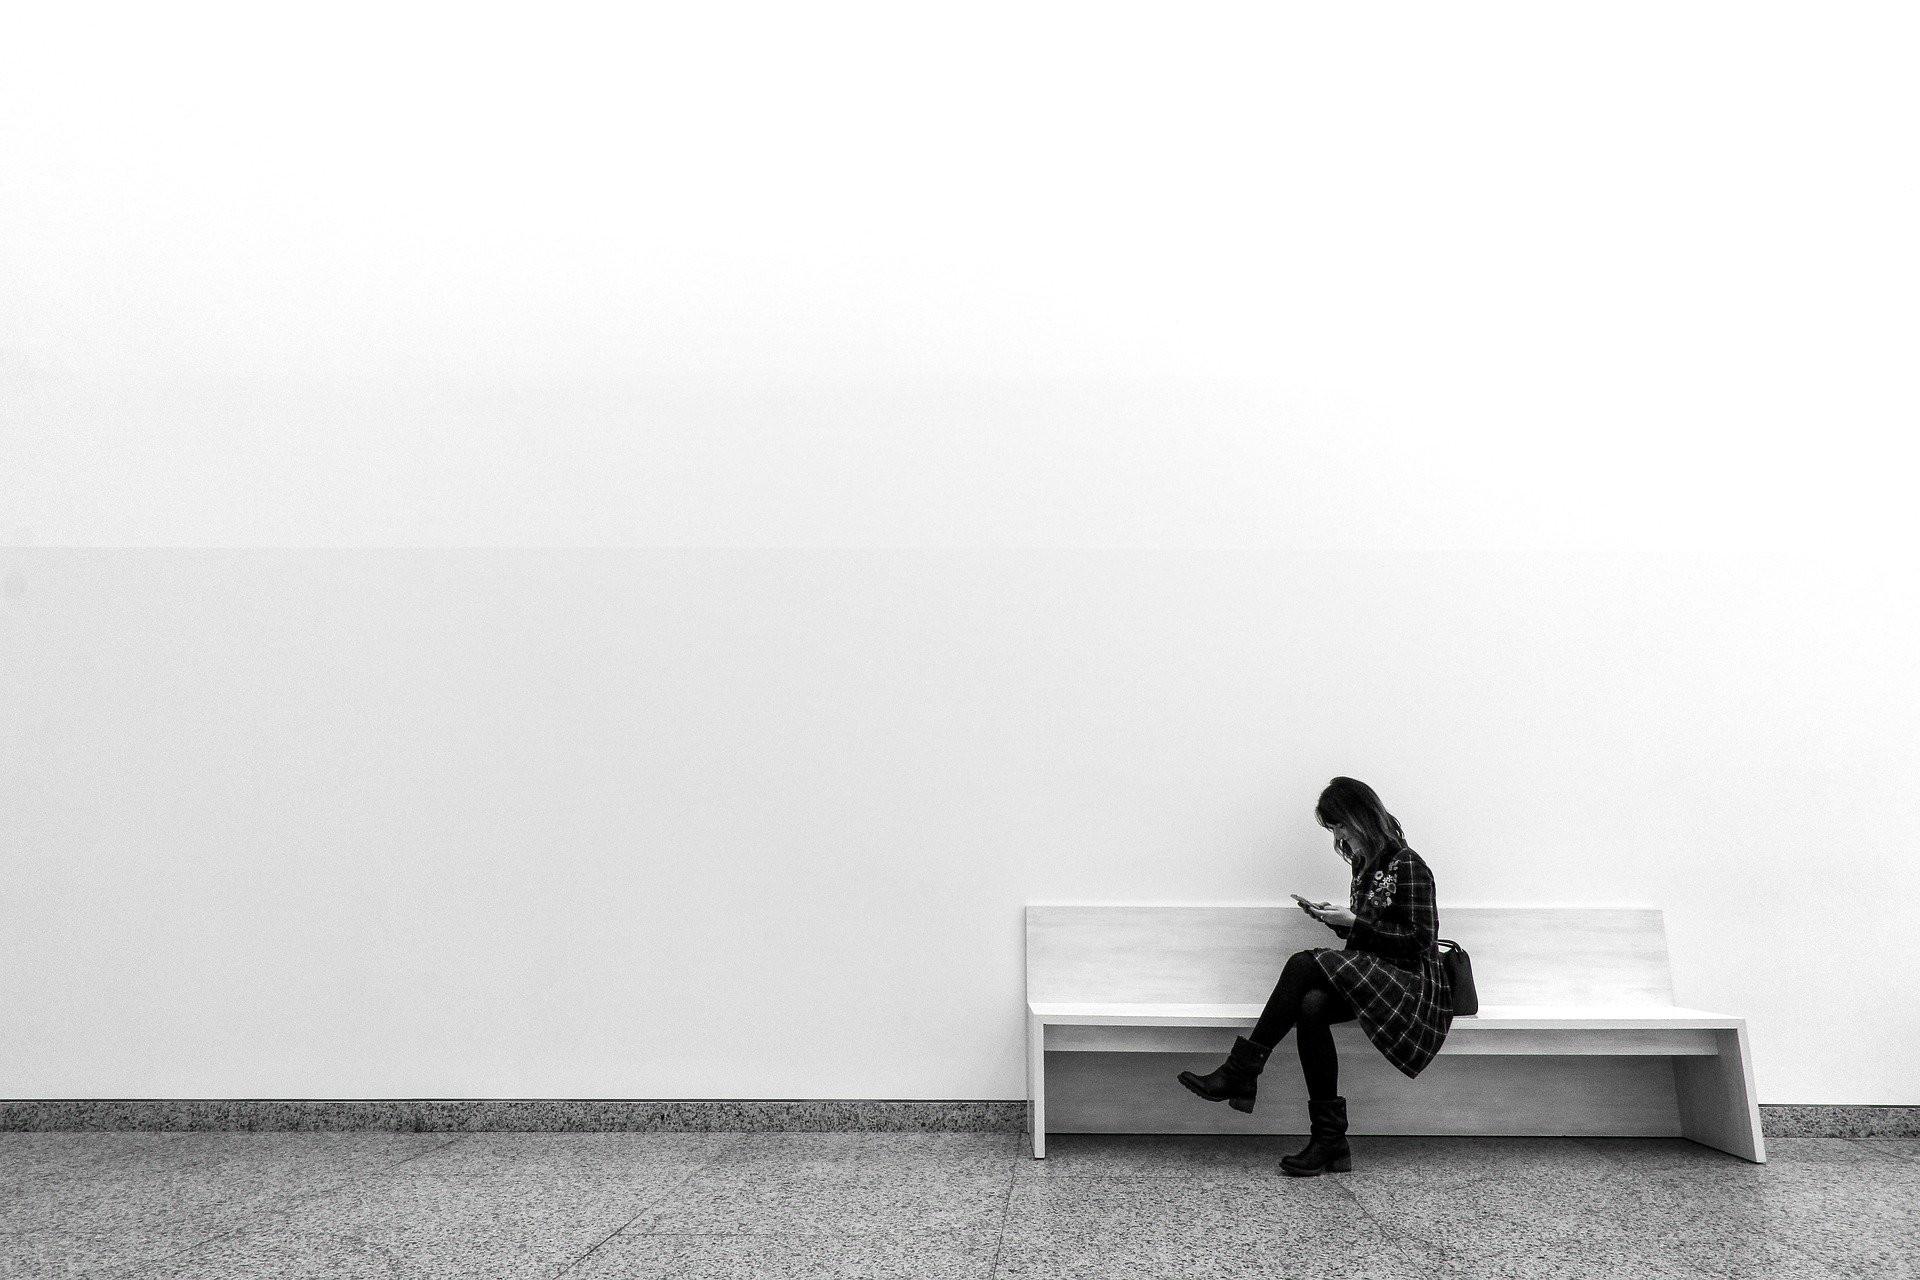 5 Alasan Wanita Malas Menjalin Hubungan dengan Seorang Pria - JPNN.com